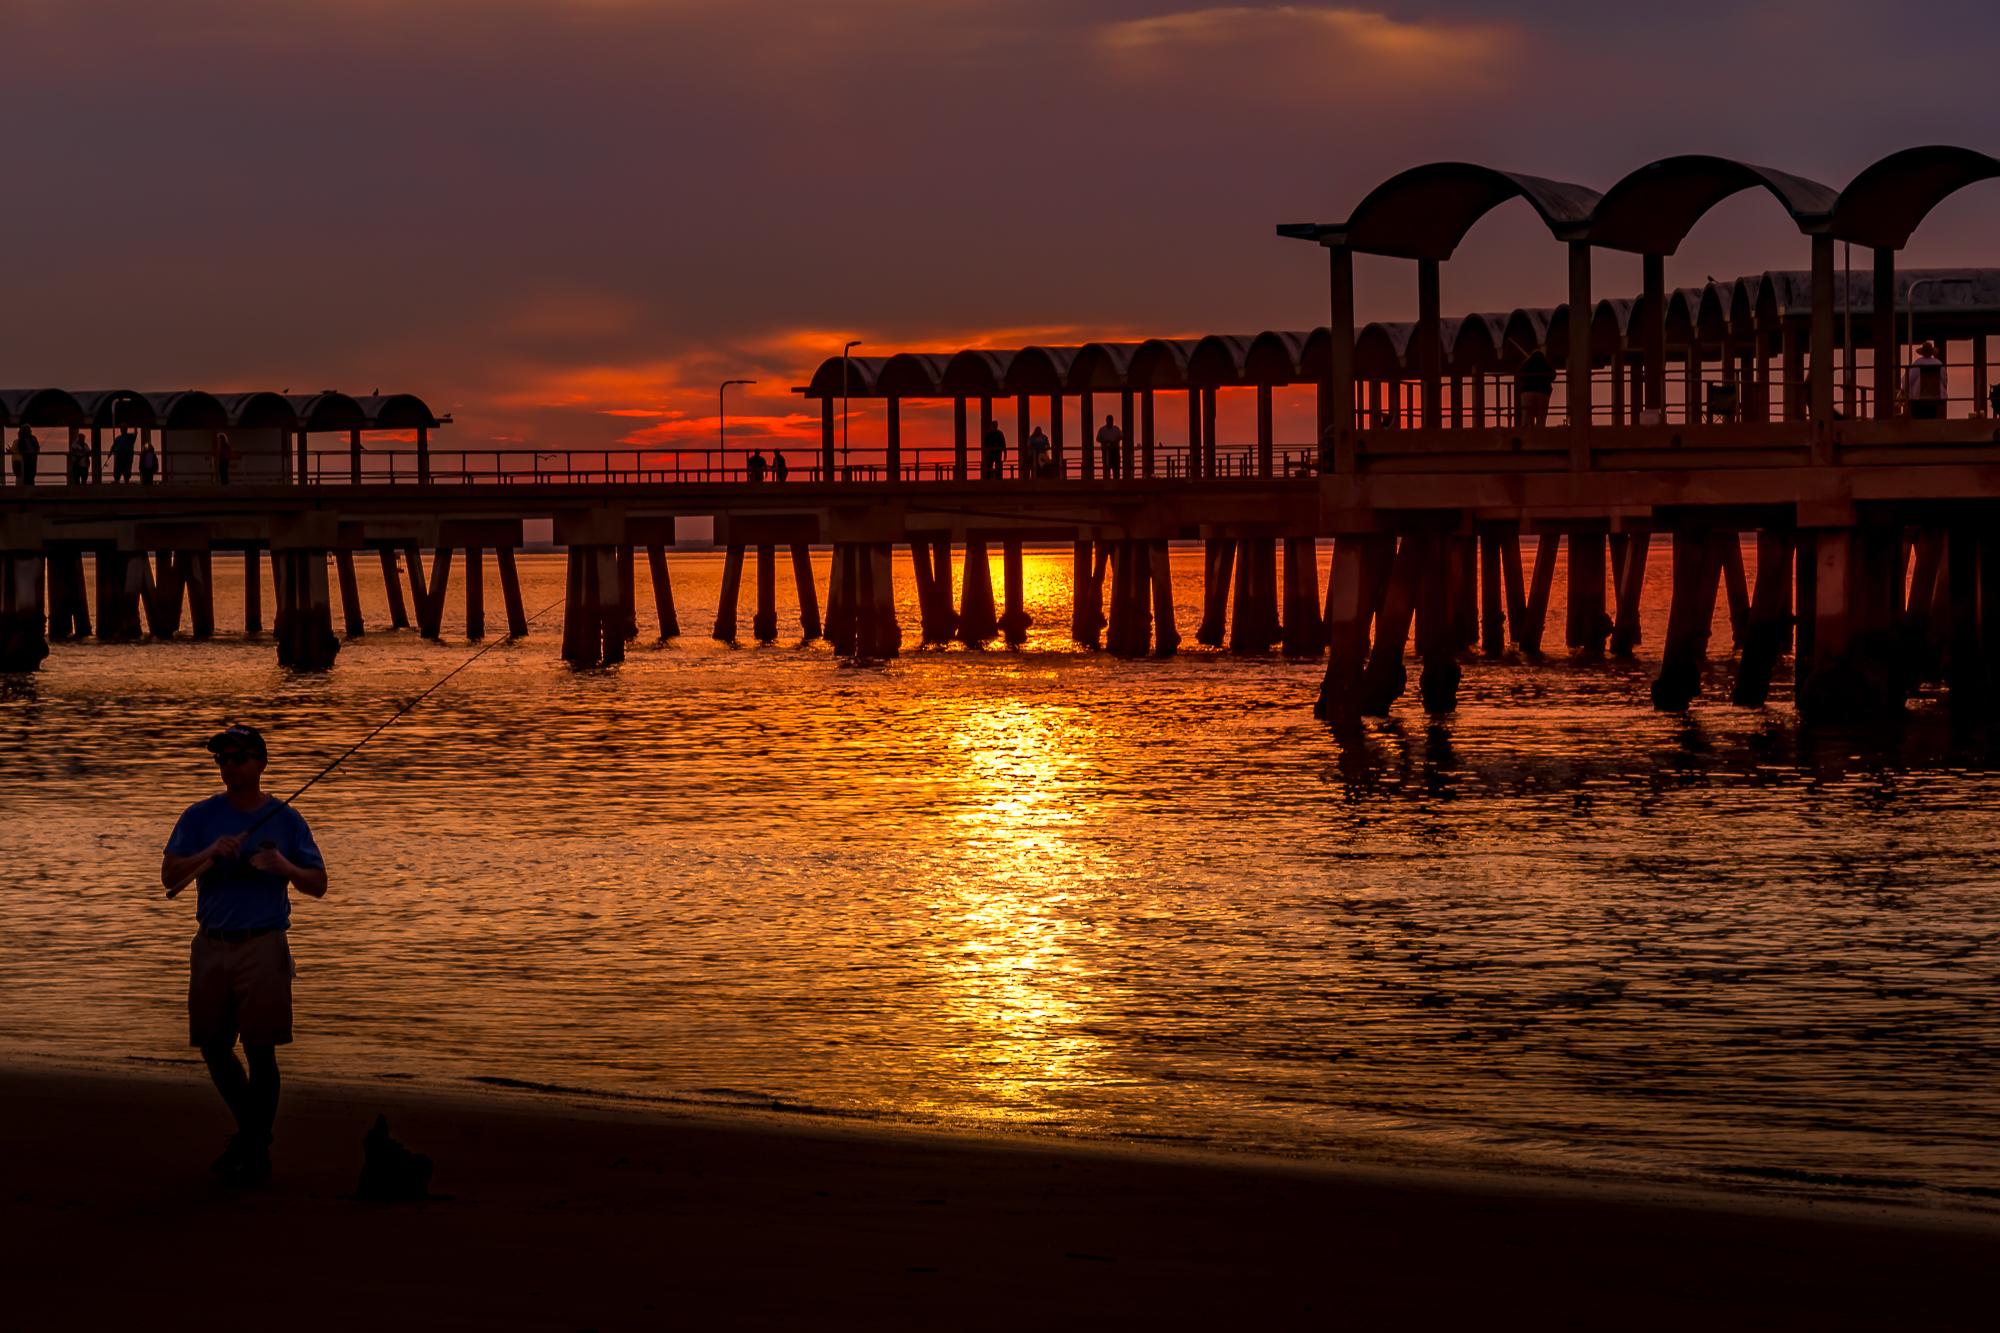 58055A - Fisherman at Sunset